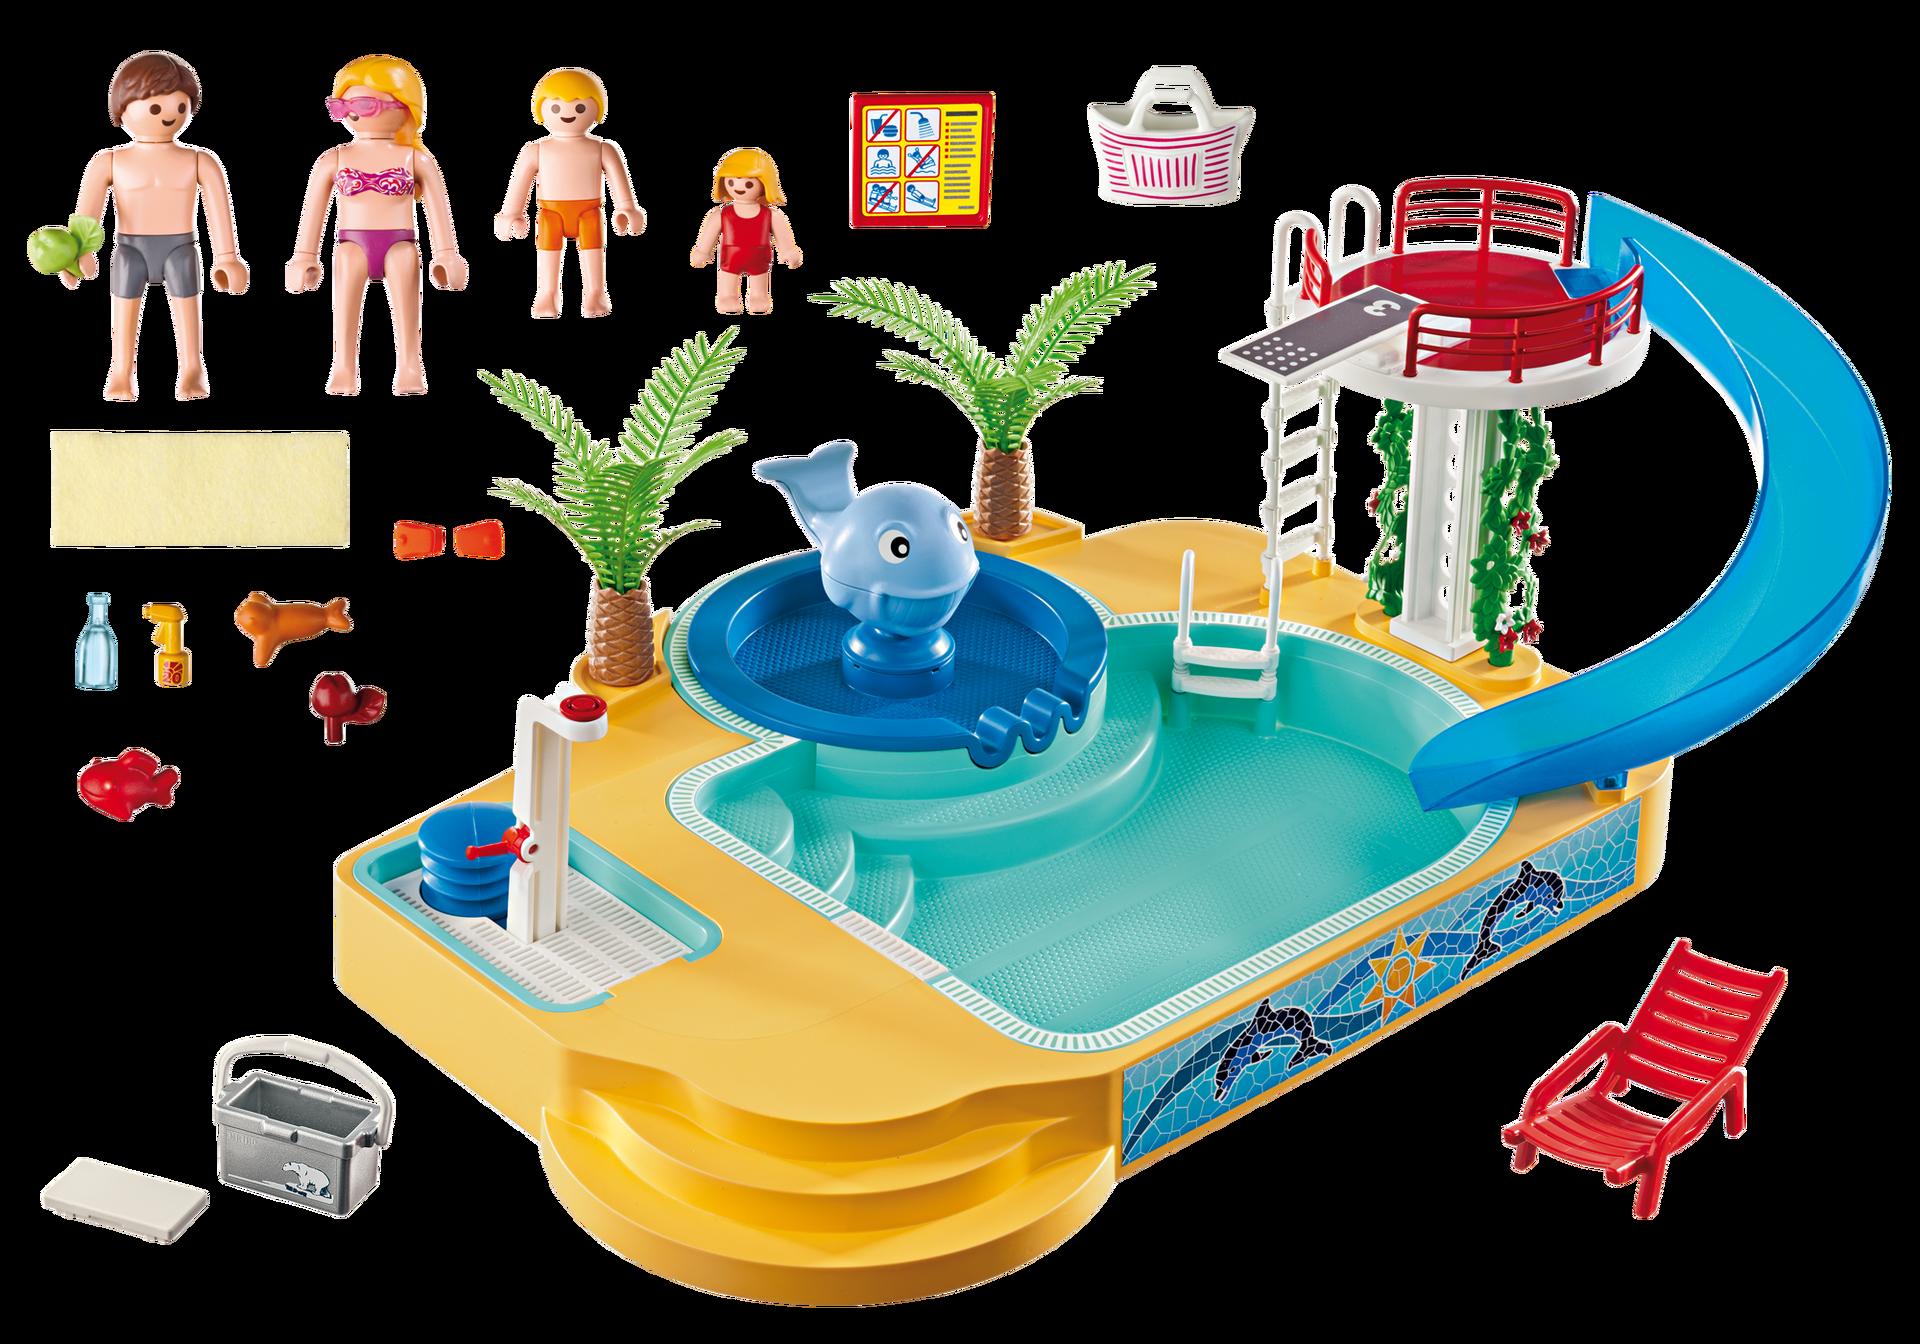 Piscina de los ni os con fuente de ballena 5433 for Piscina playmobil